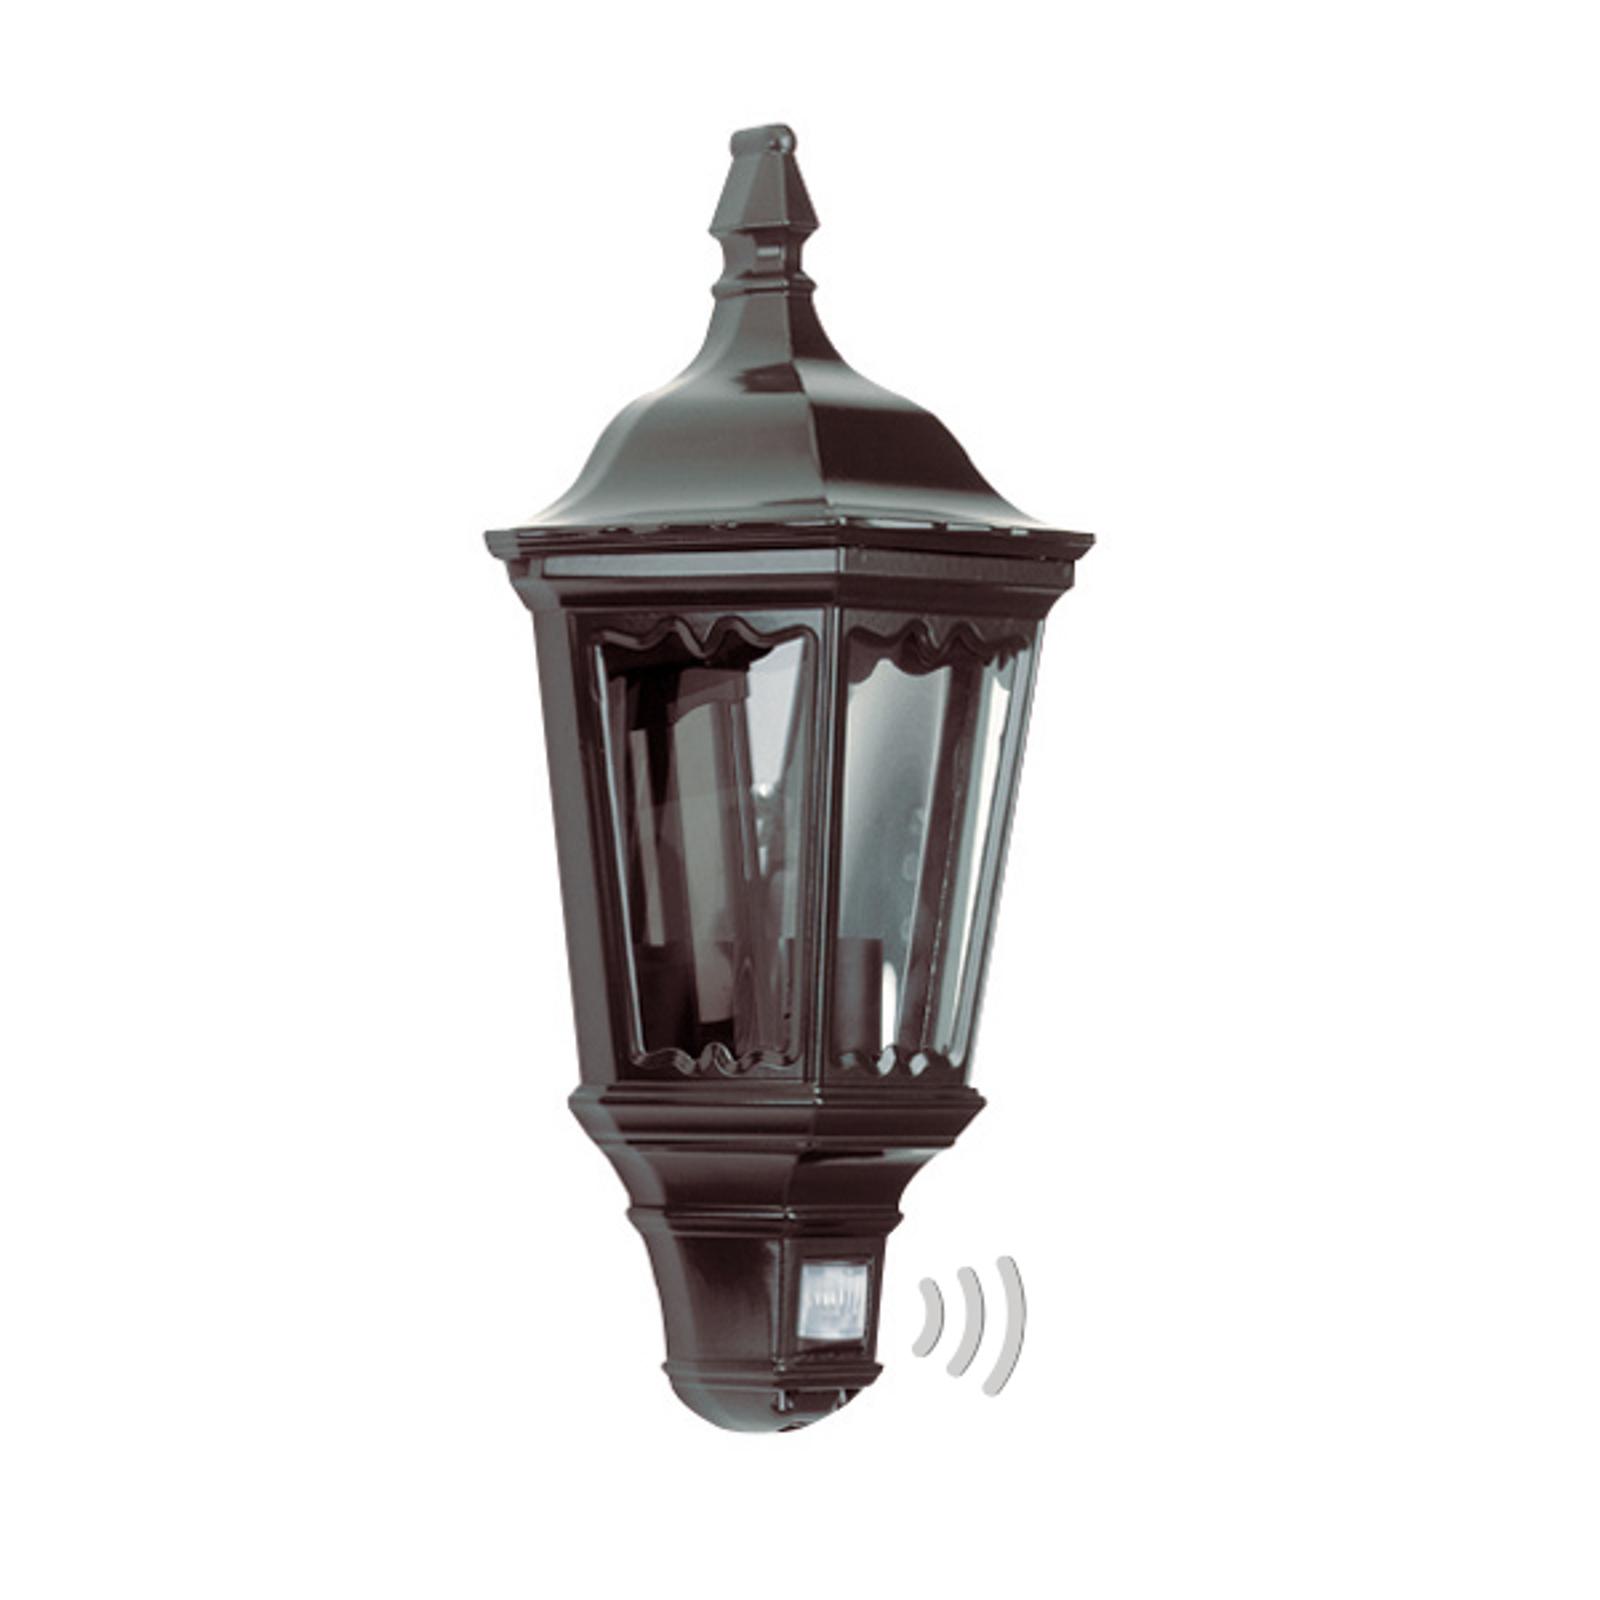 Praktische buitenwandlamp Ancona, zwart